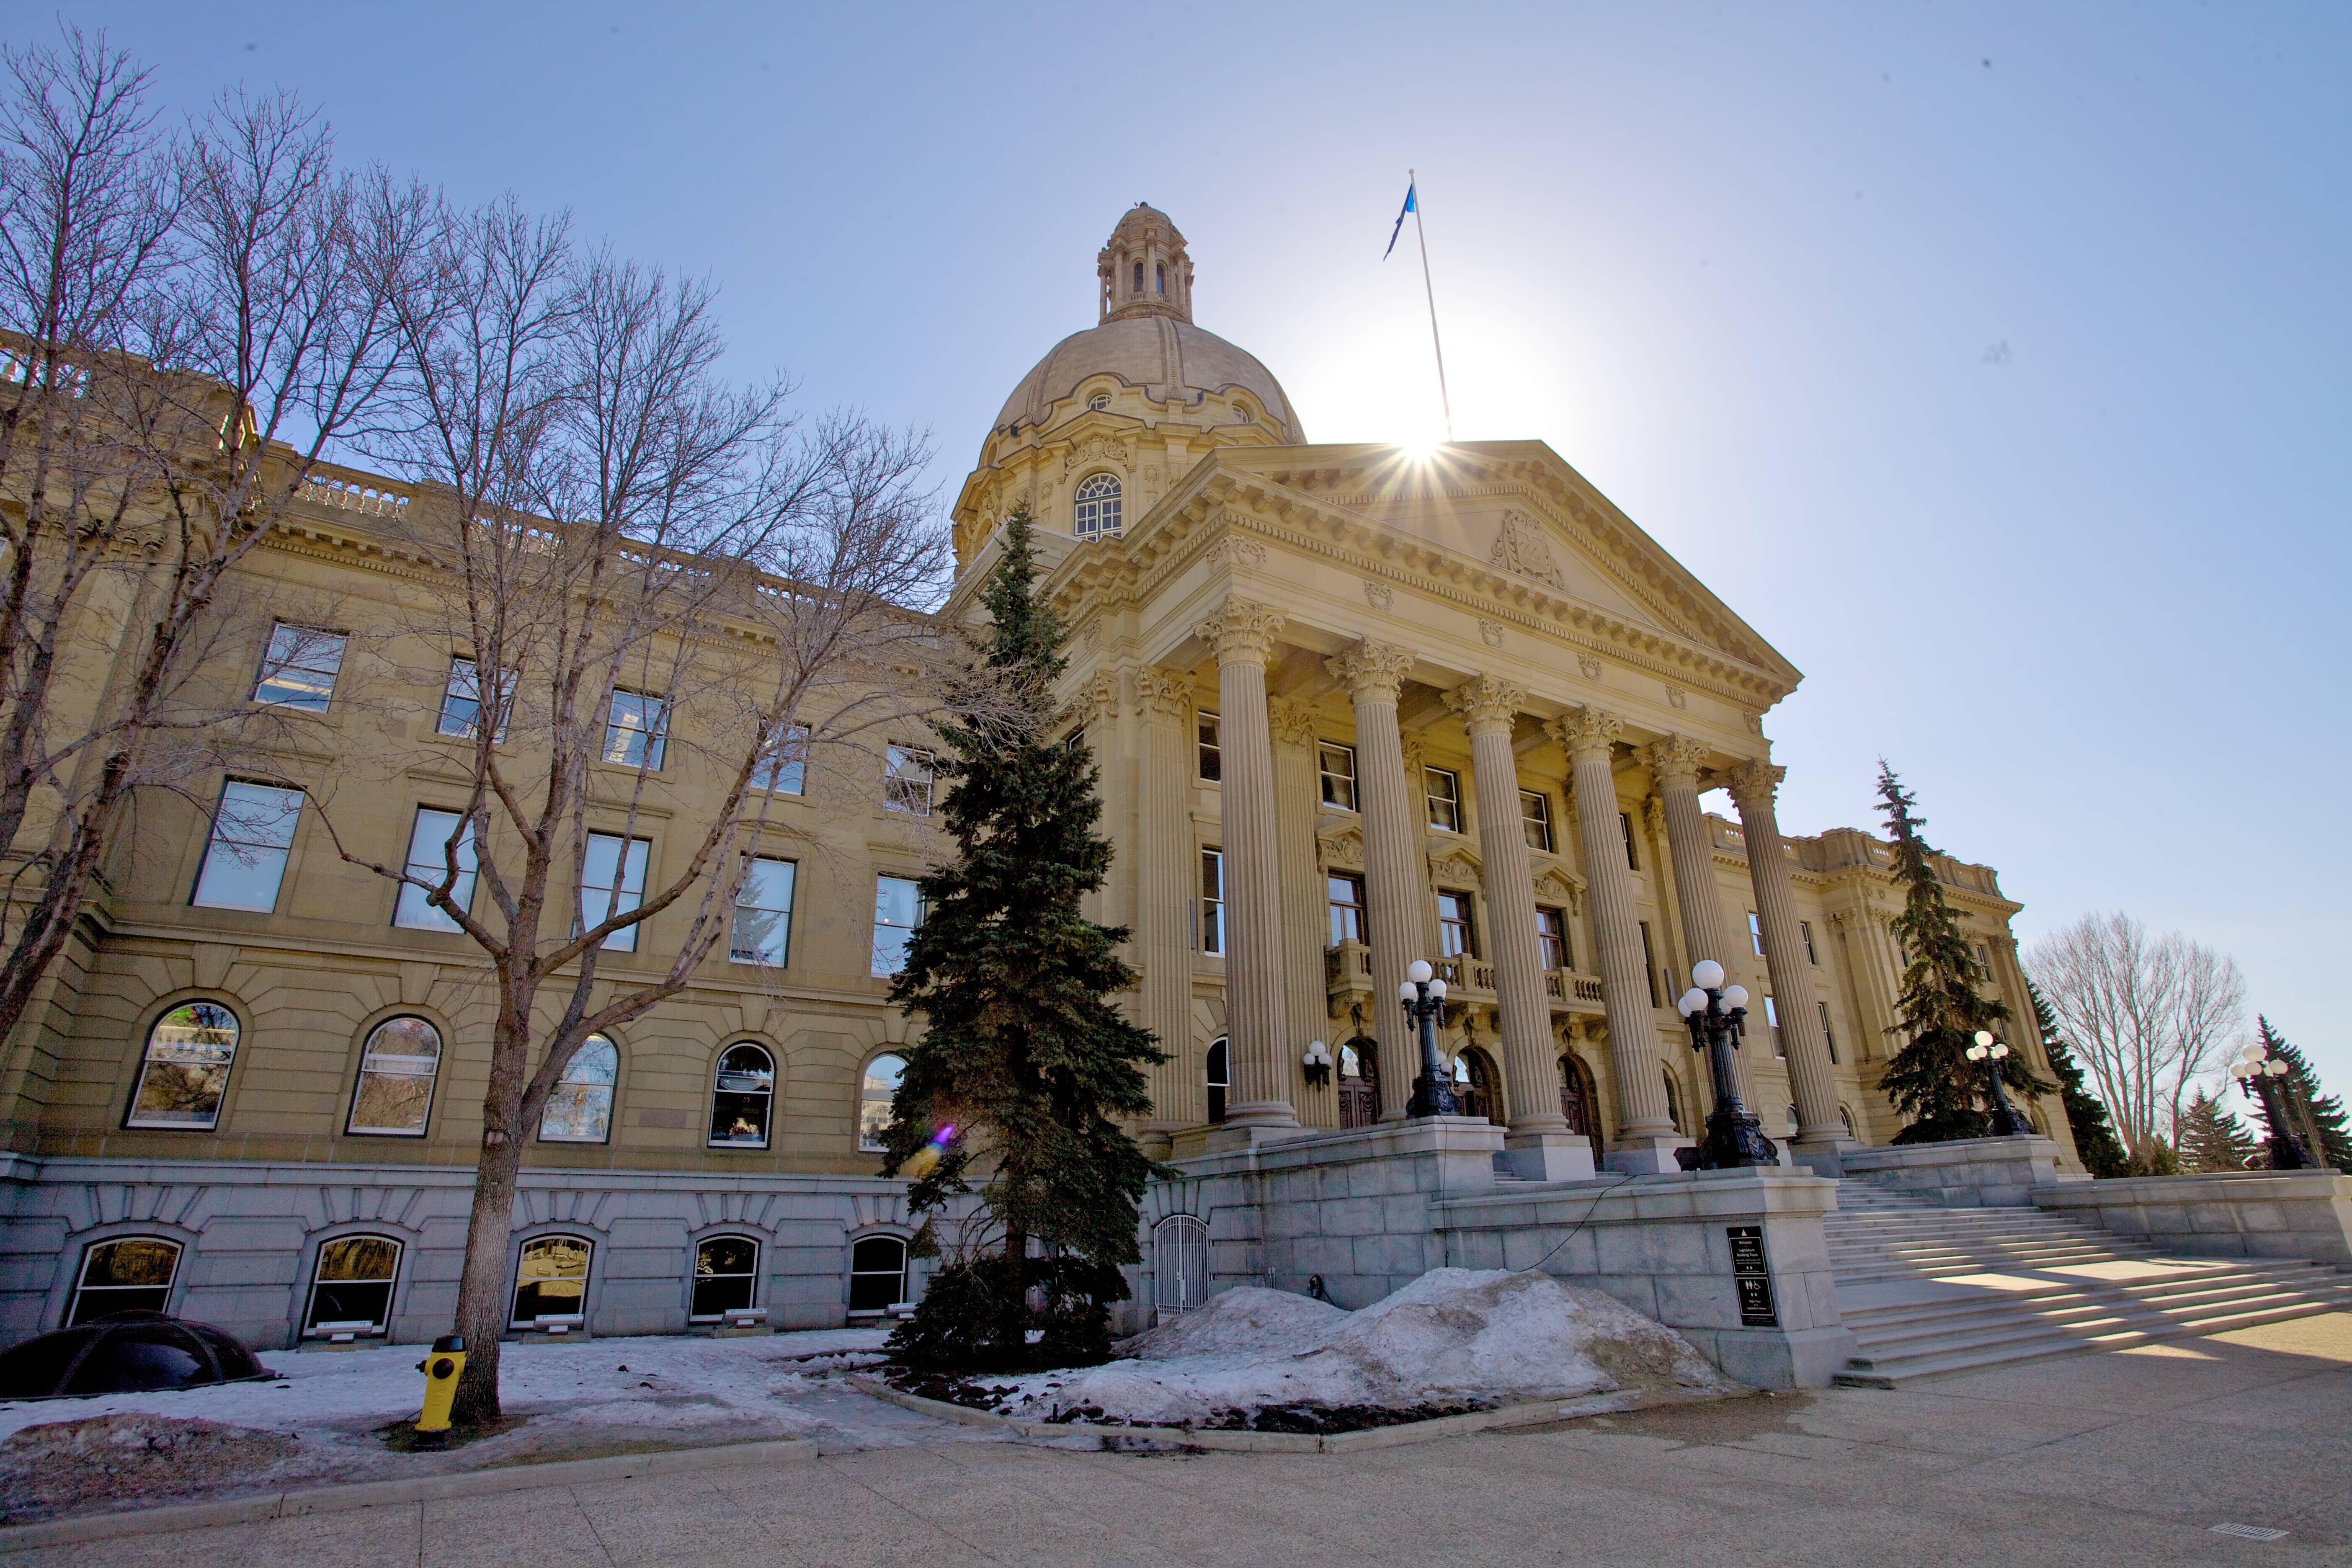 Exterior view of the Alberta Legislative Building in winter